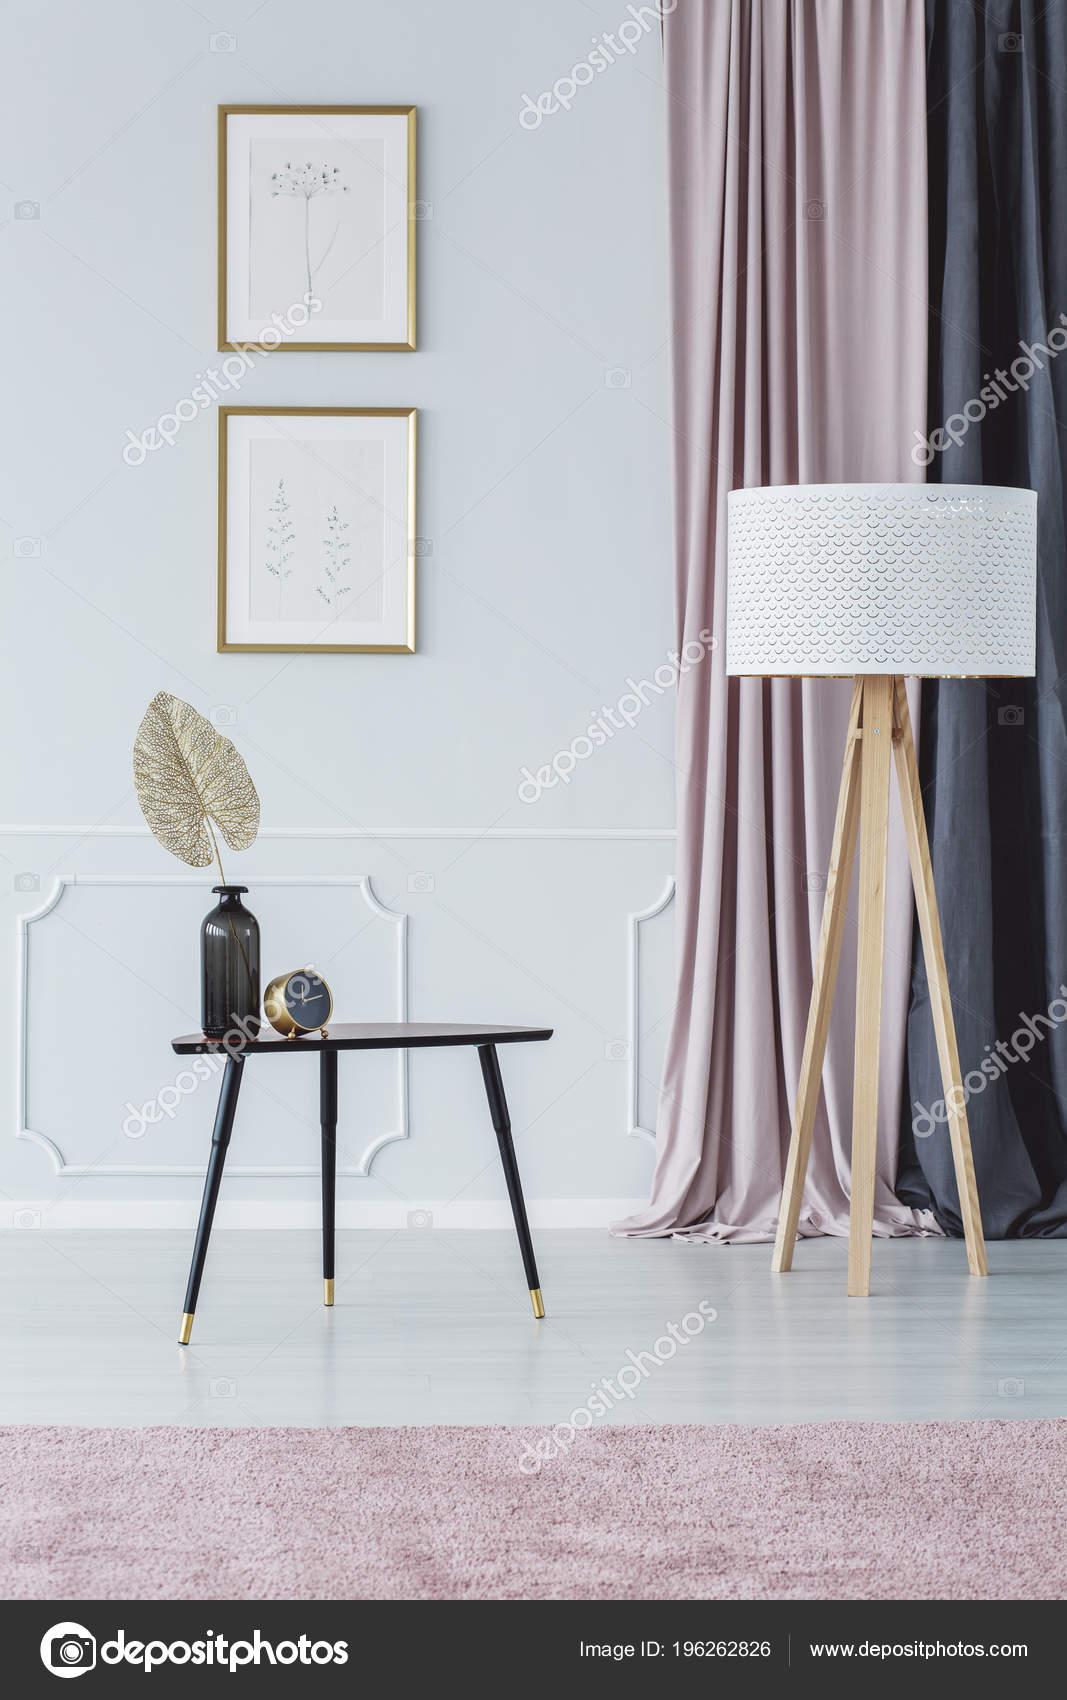 Lamp Naast Zwarte Tabel Tegen Muur Met Posters Roze Woonkamer ...